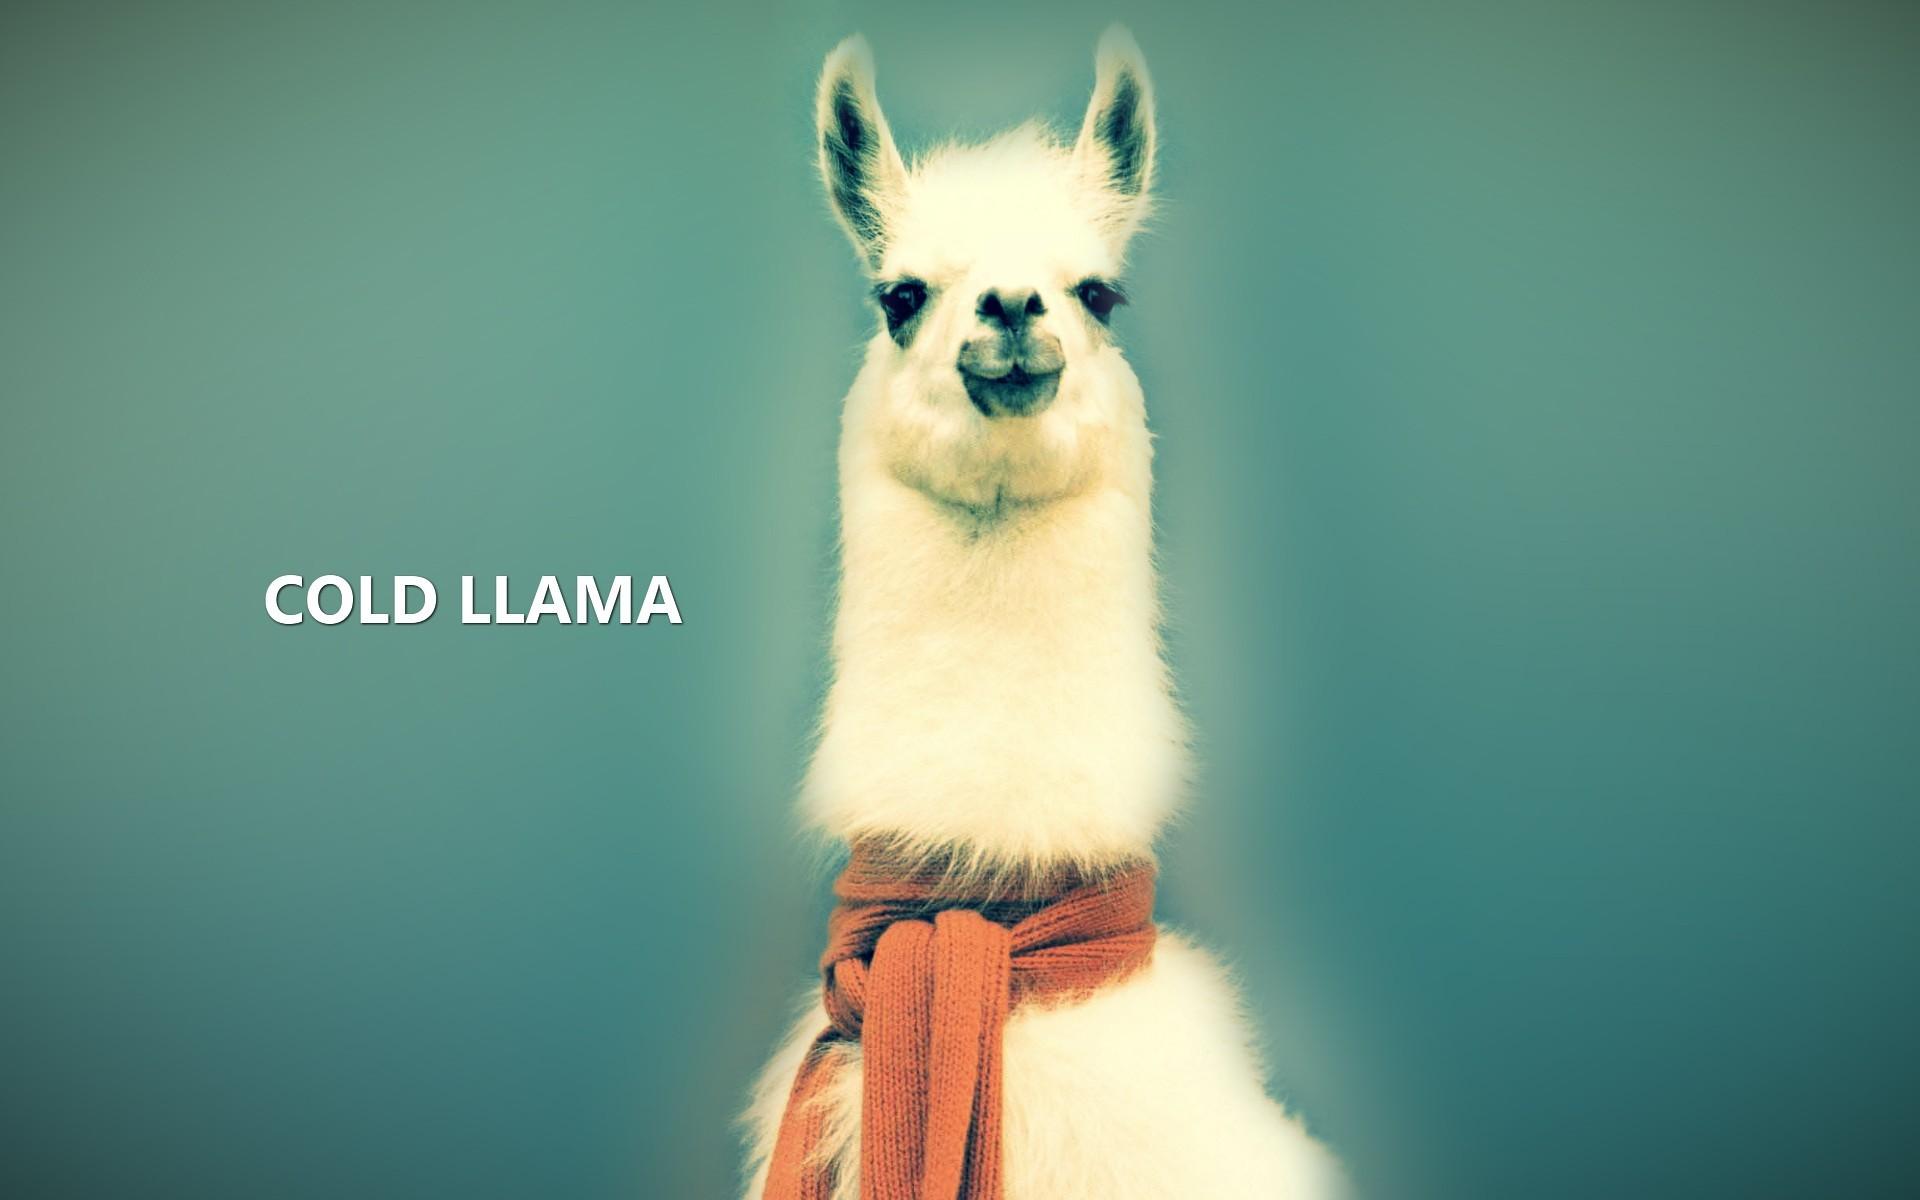 Cute Alpaca Wallpaper Animals Lama Llamas Abstract Nature Wallpapers Hd